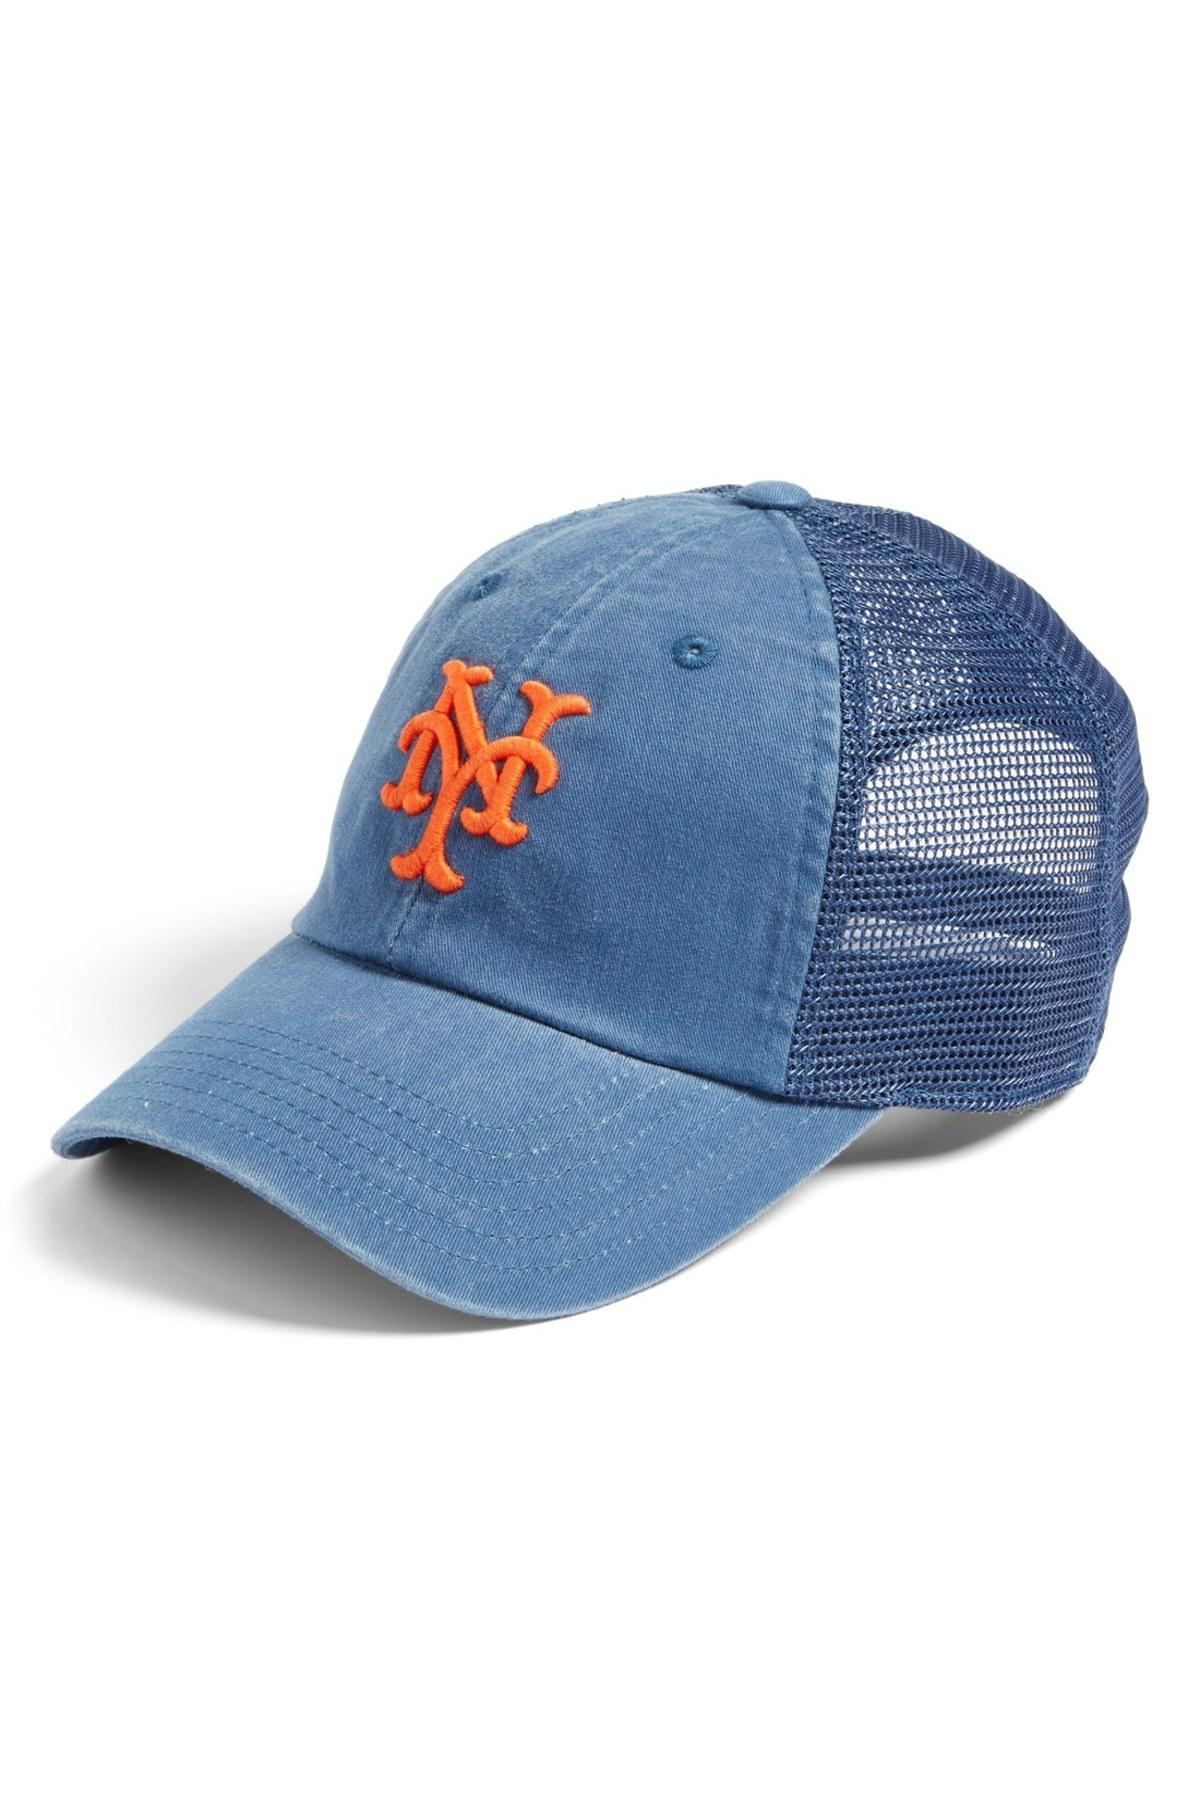 Lyst - American Needle Raglan Bones - New York Mets Trucker Hat in ... cb0cc3cbe5fb